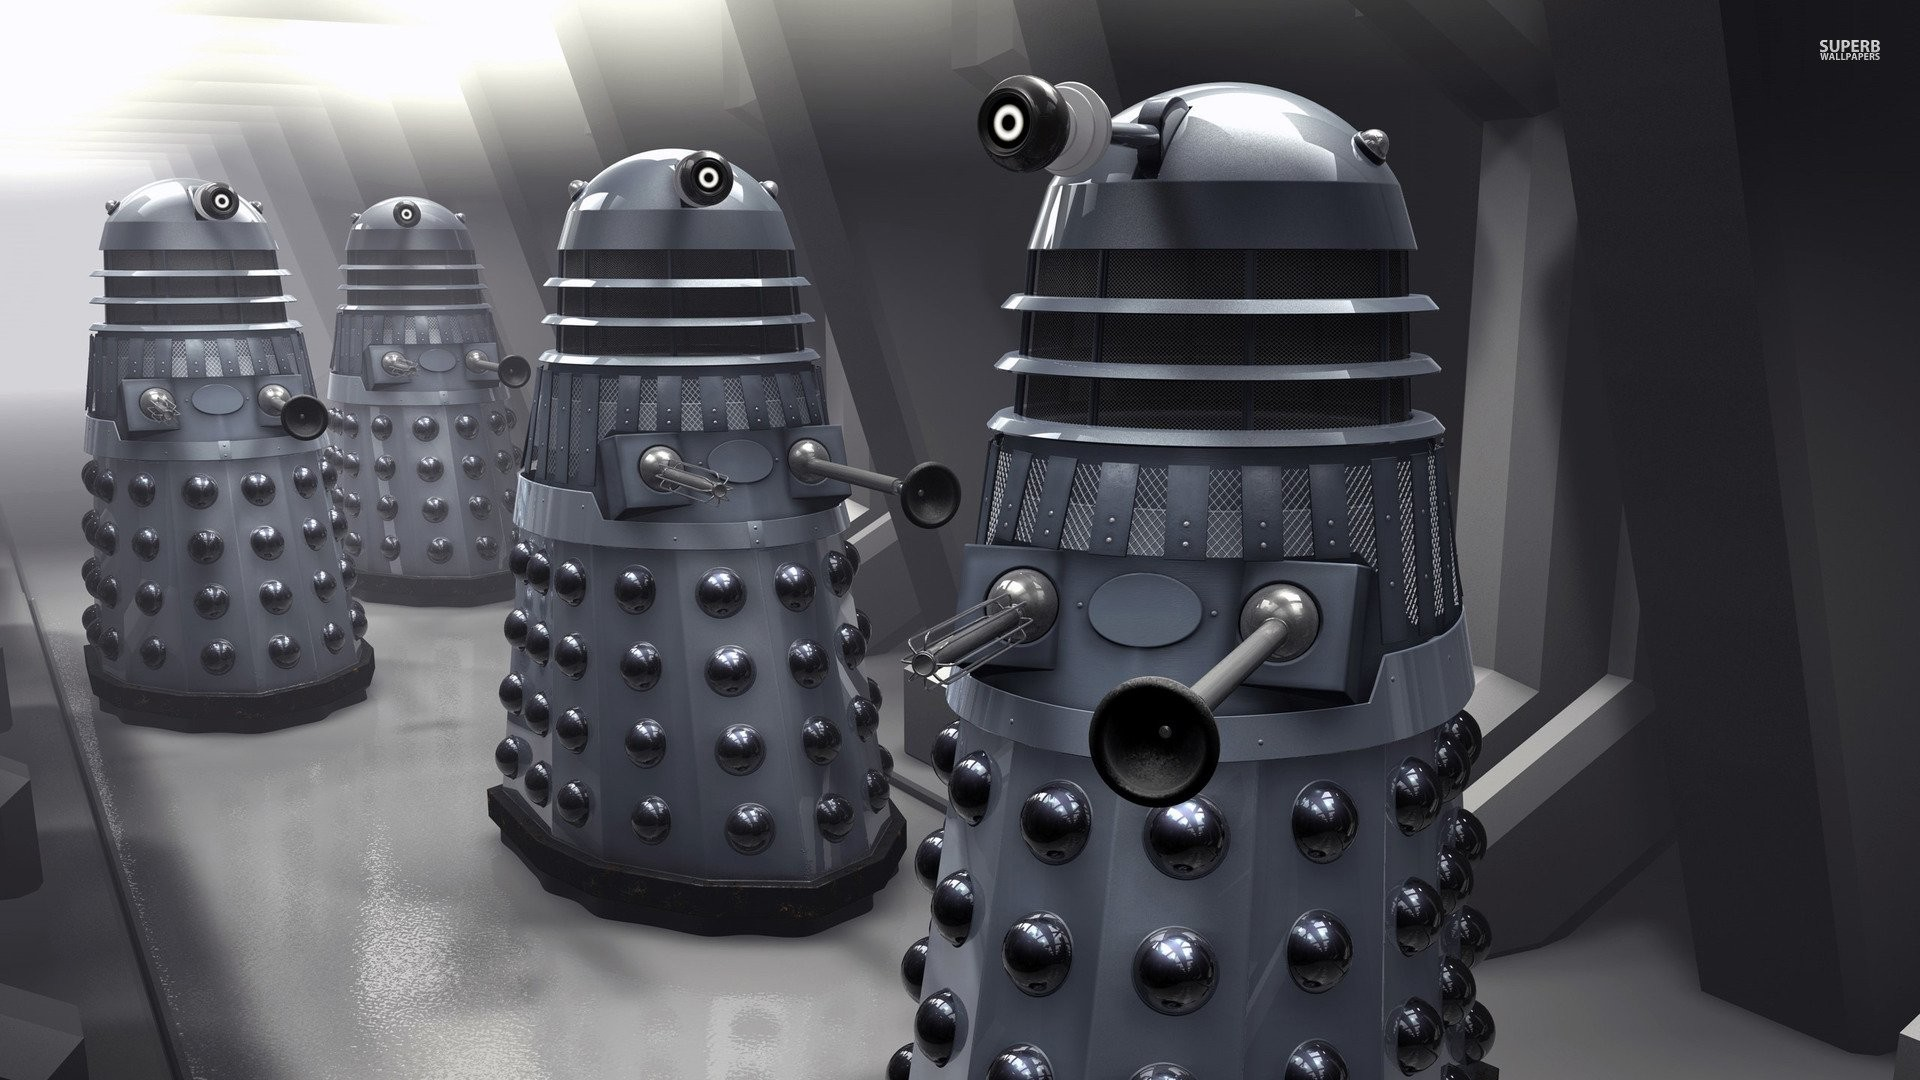 Doctor Who Wallpaper Dalek Exterminate Dalek Wallpaper ·...